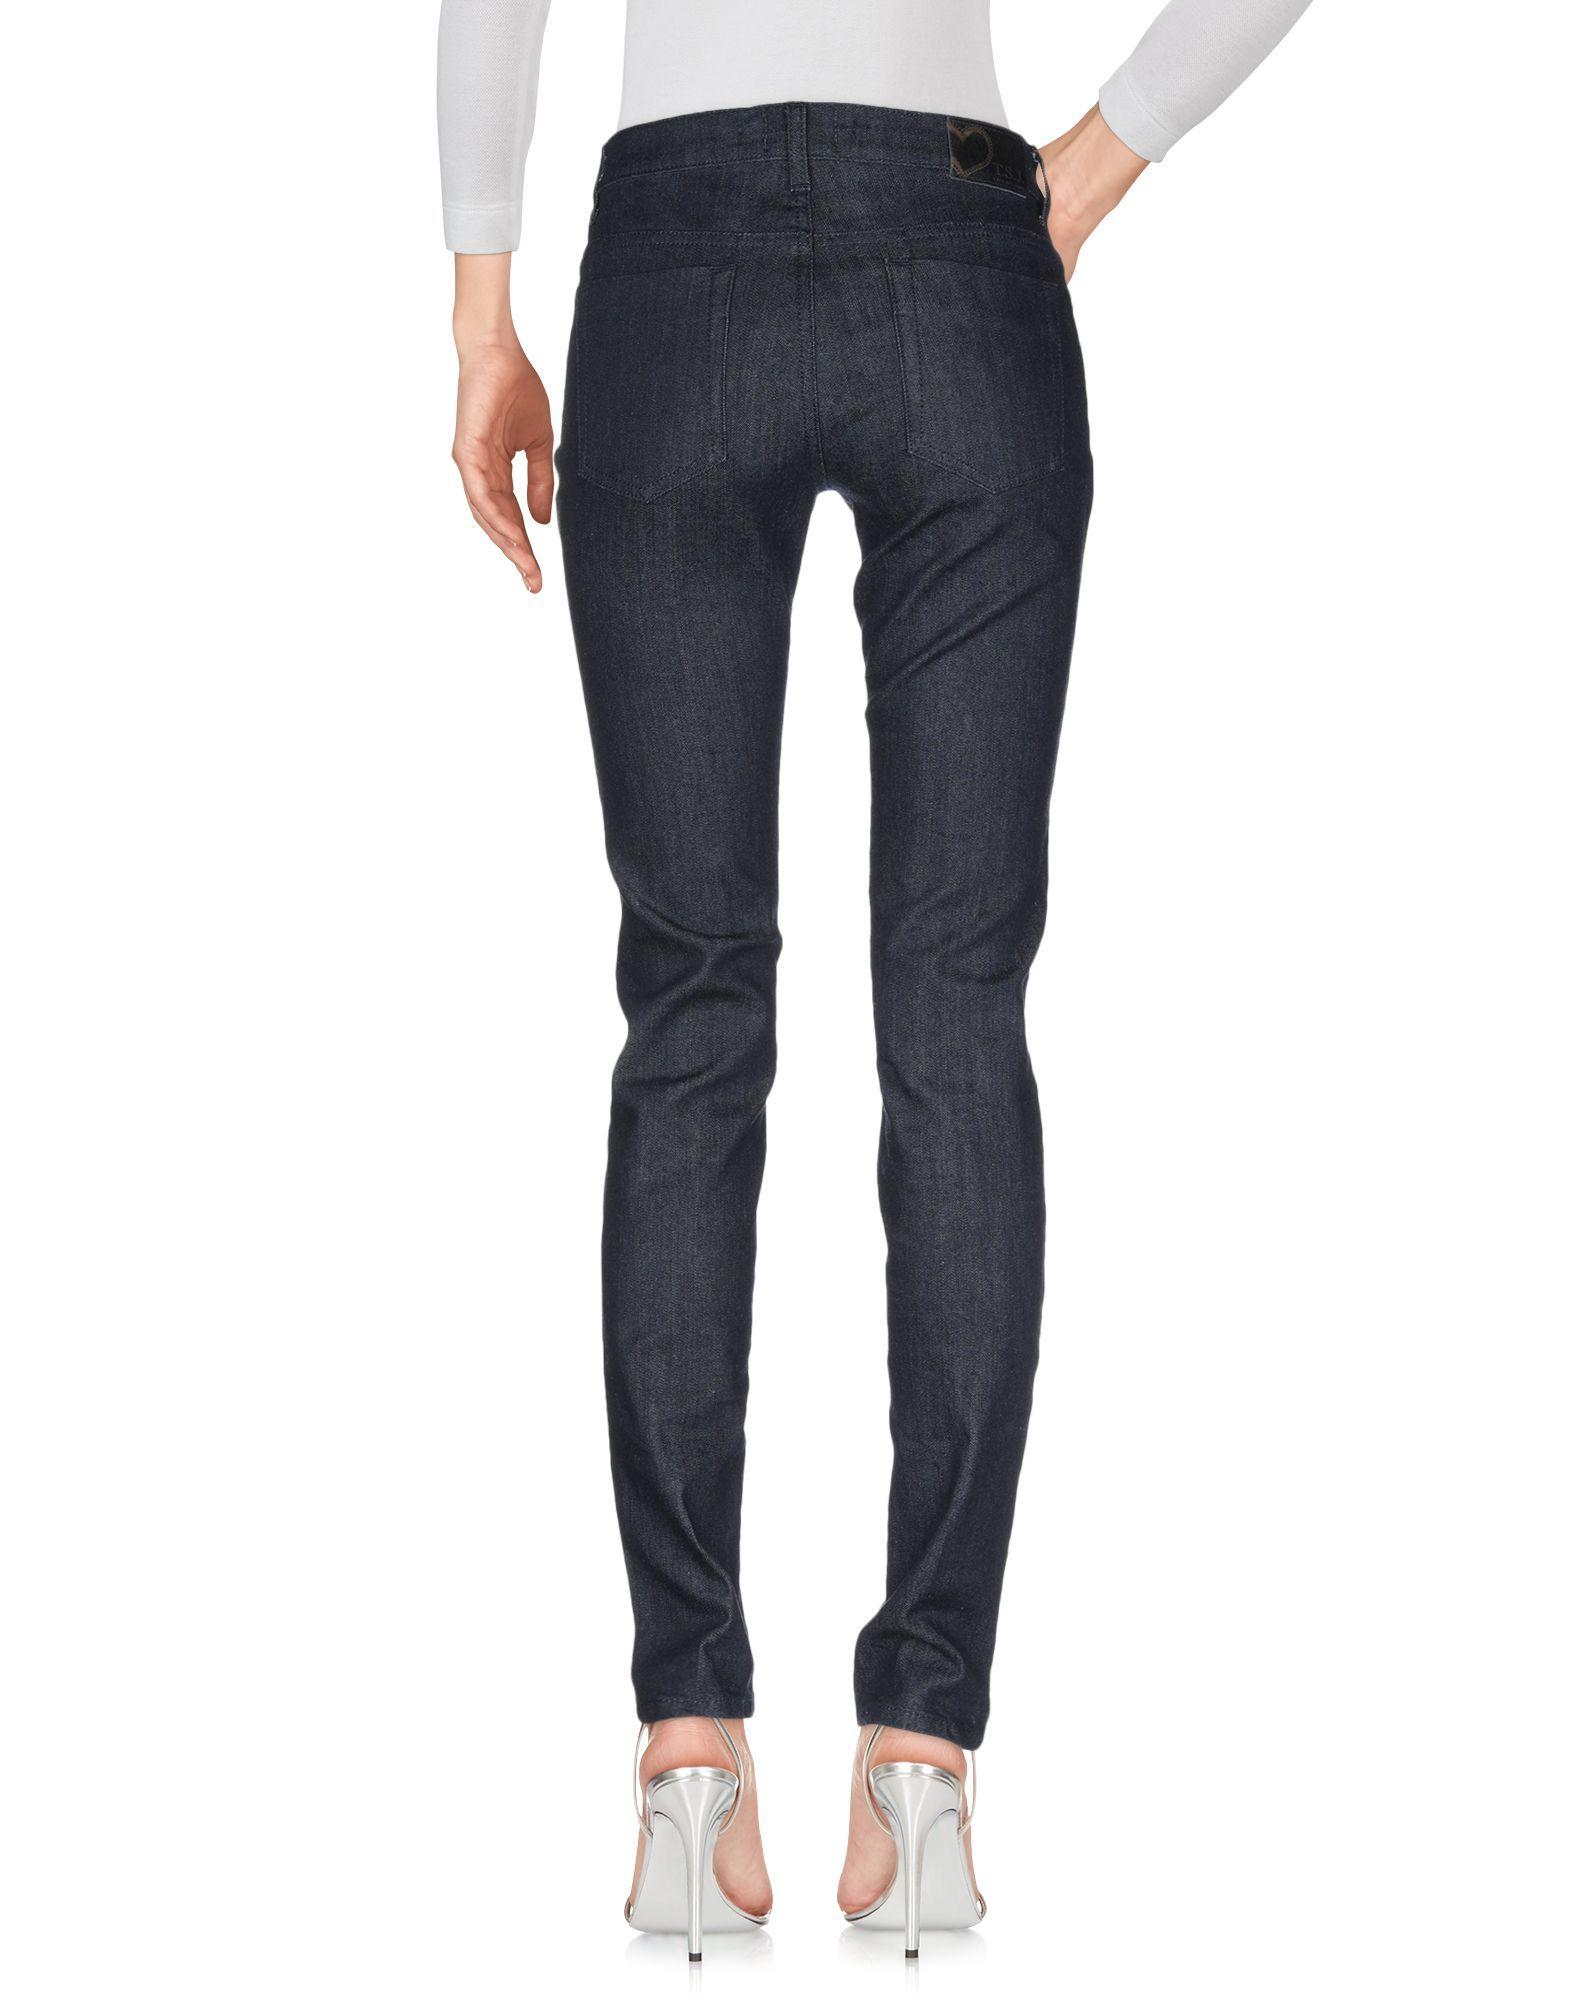 Twin-Set Jeans Blue Cotton Dark Wash Jeans